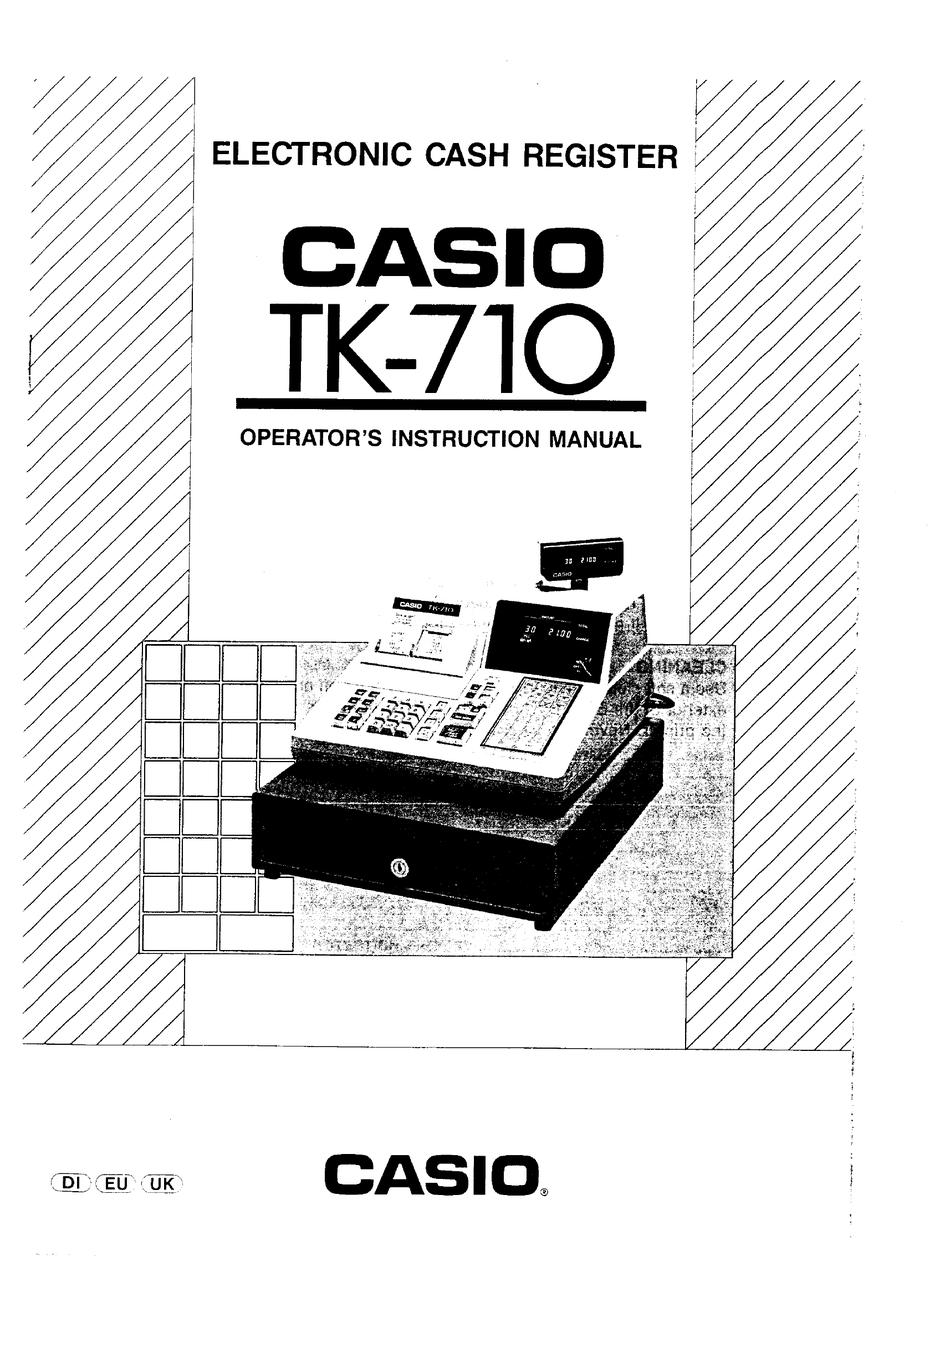 CASIO TK-710 OPERATOR'S INSTRUCTION MANUAL Pdf Download